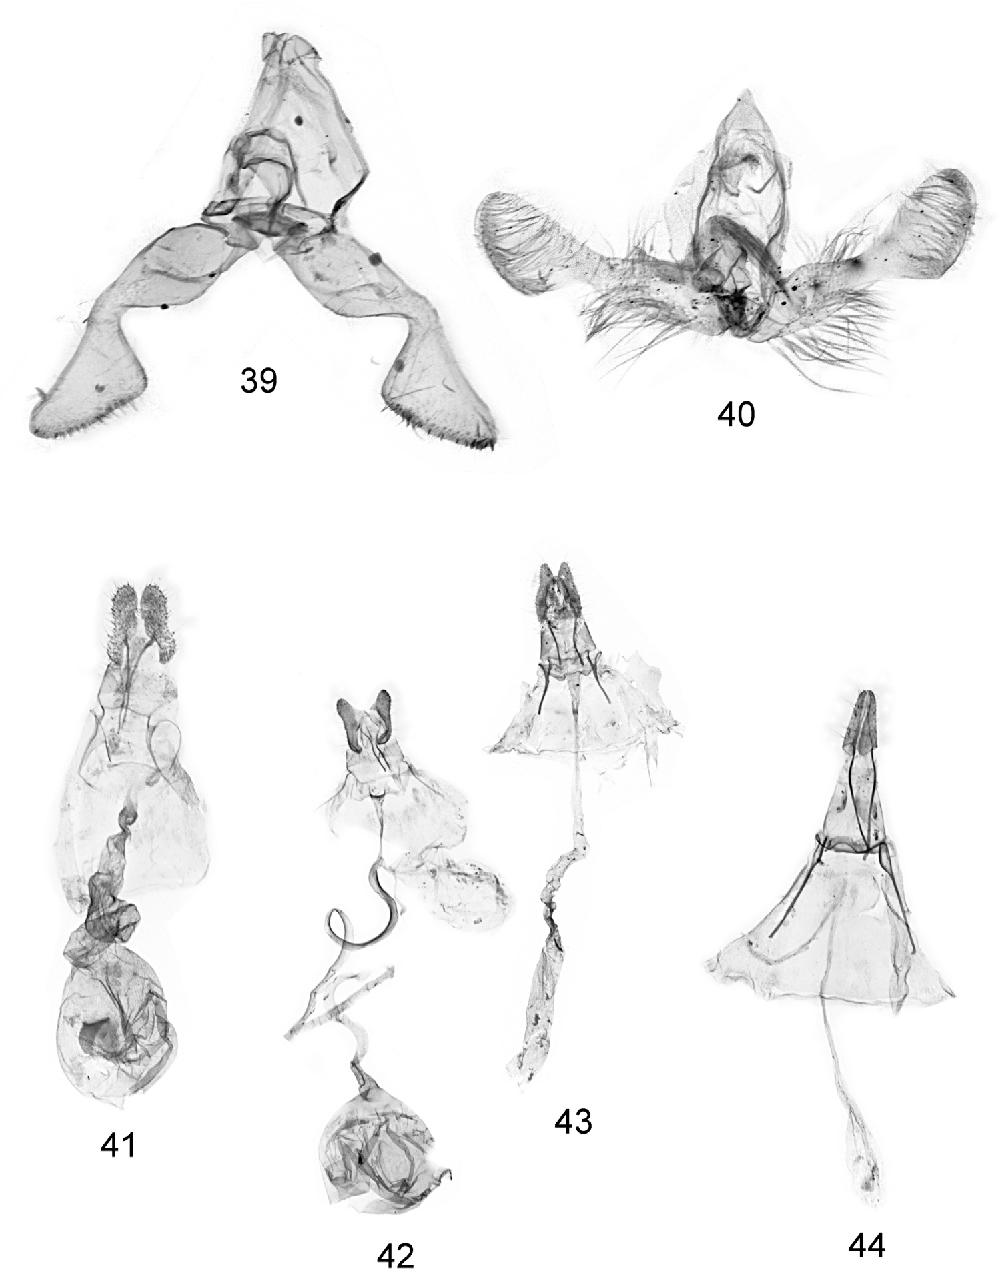 figure 39-44